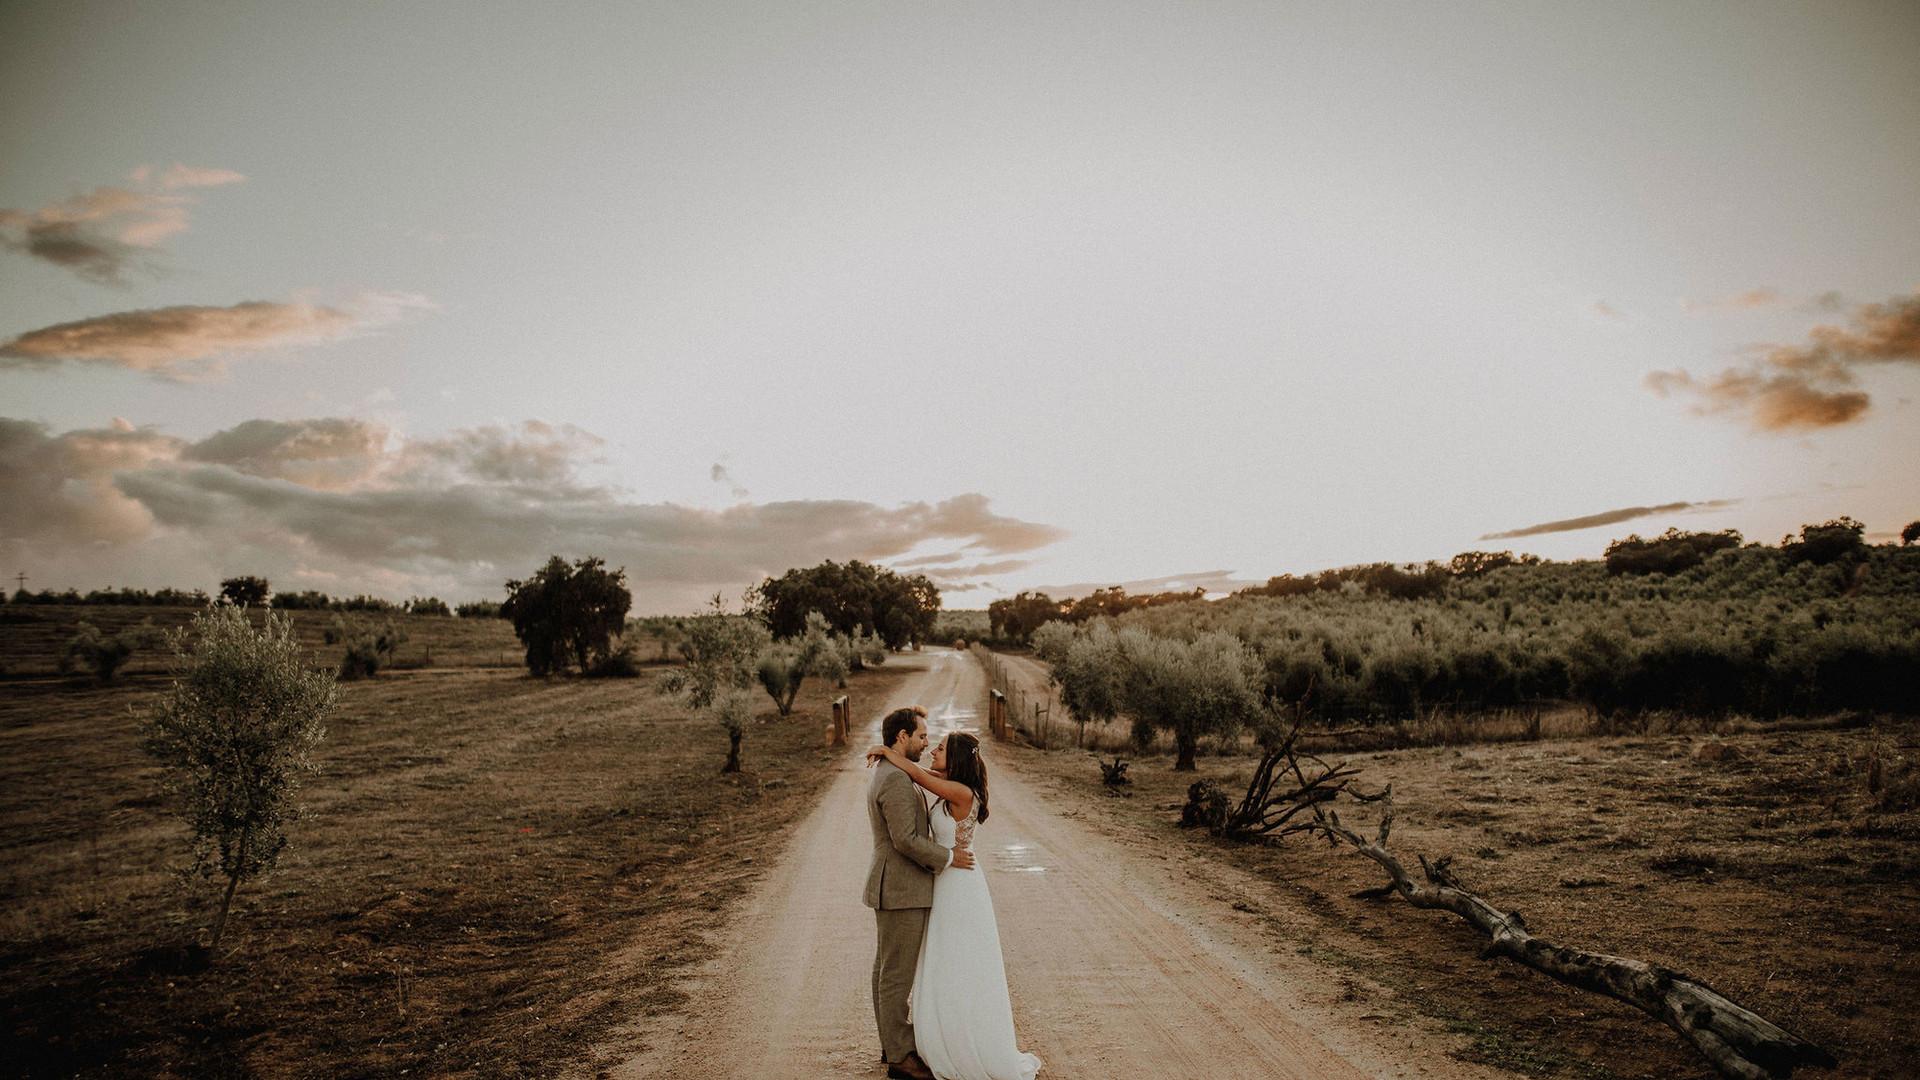 Bride & groom posing during photoshoot in Portugal